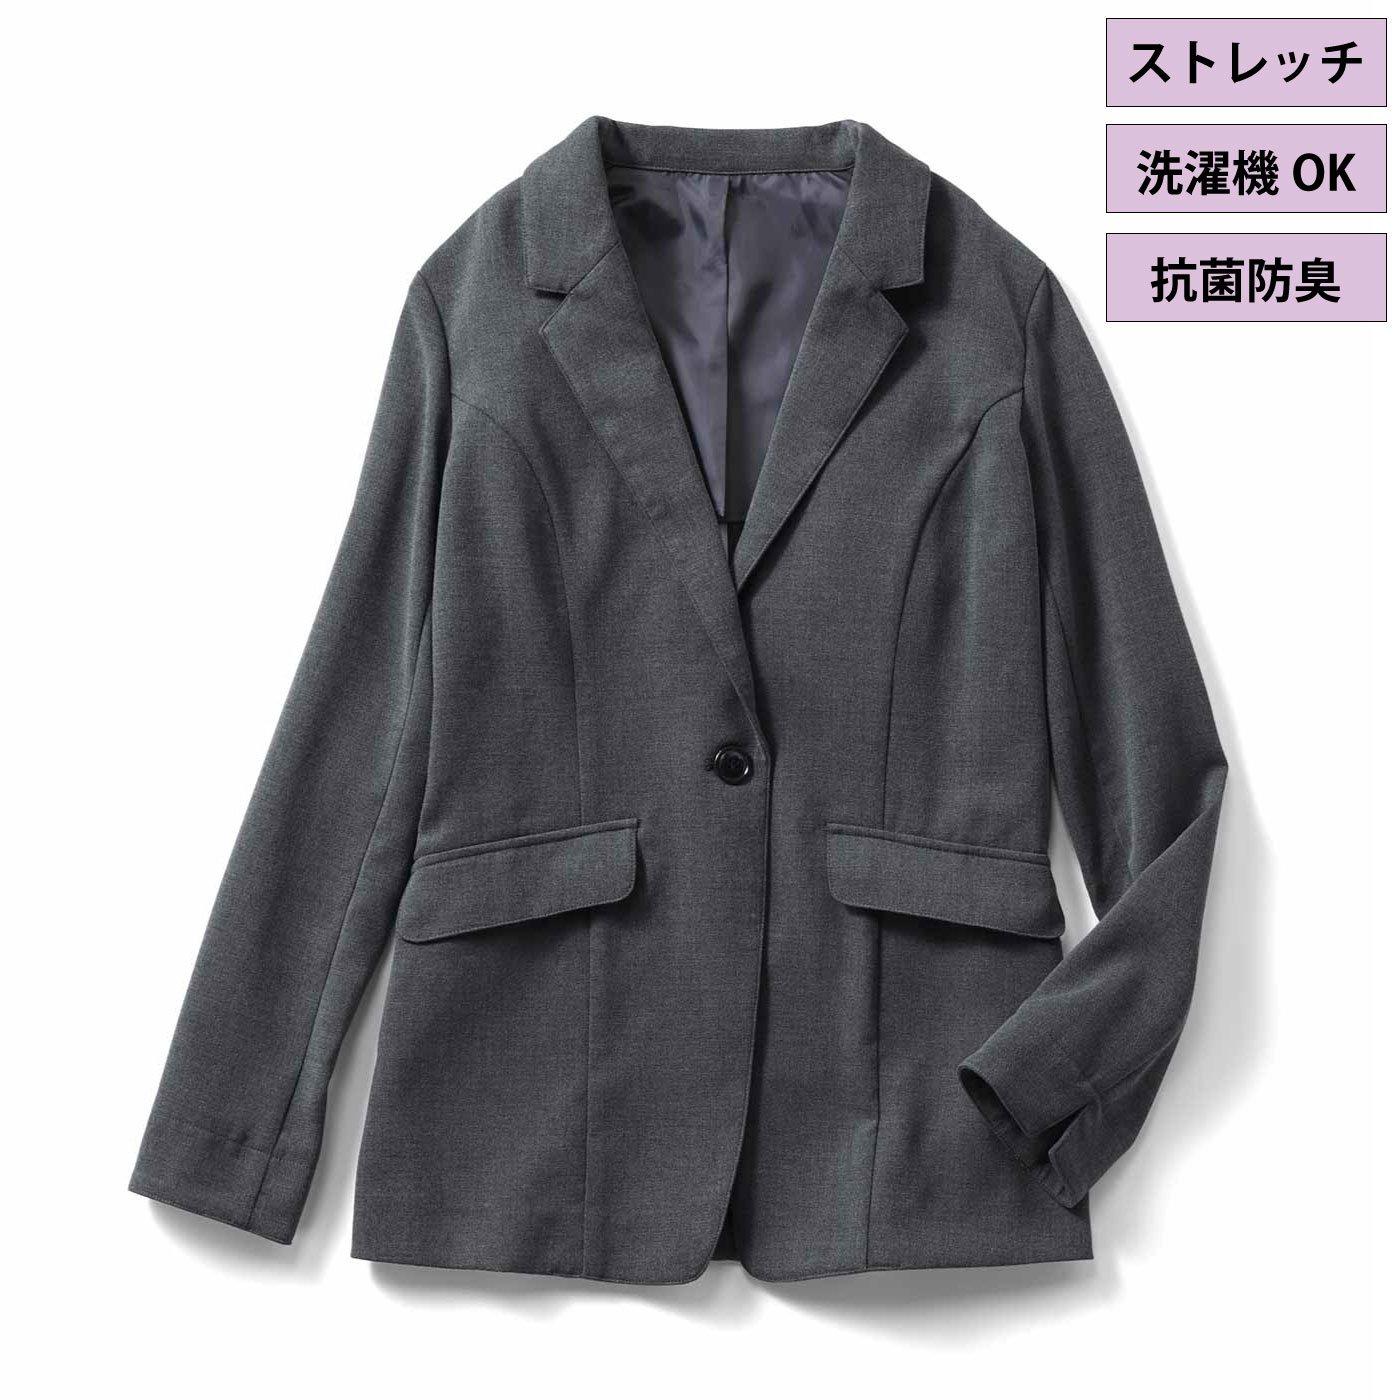 IEDIT[イディット] 抗菌防臭機能がうれしい 布はく素材のバレエフィット(R)ジャケット〈グレー〉